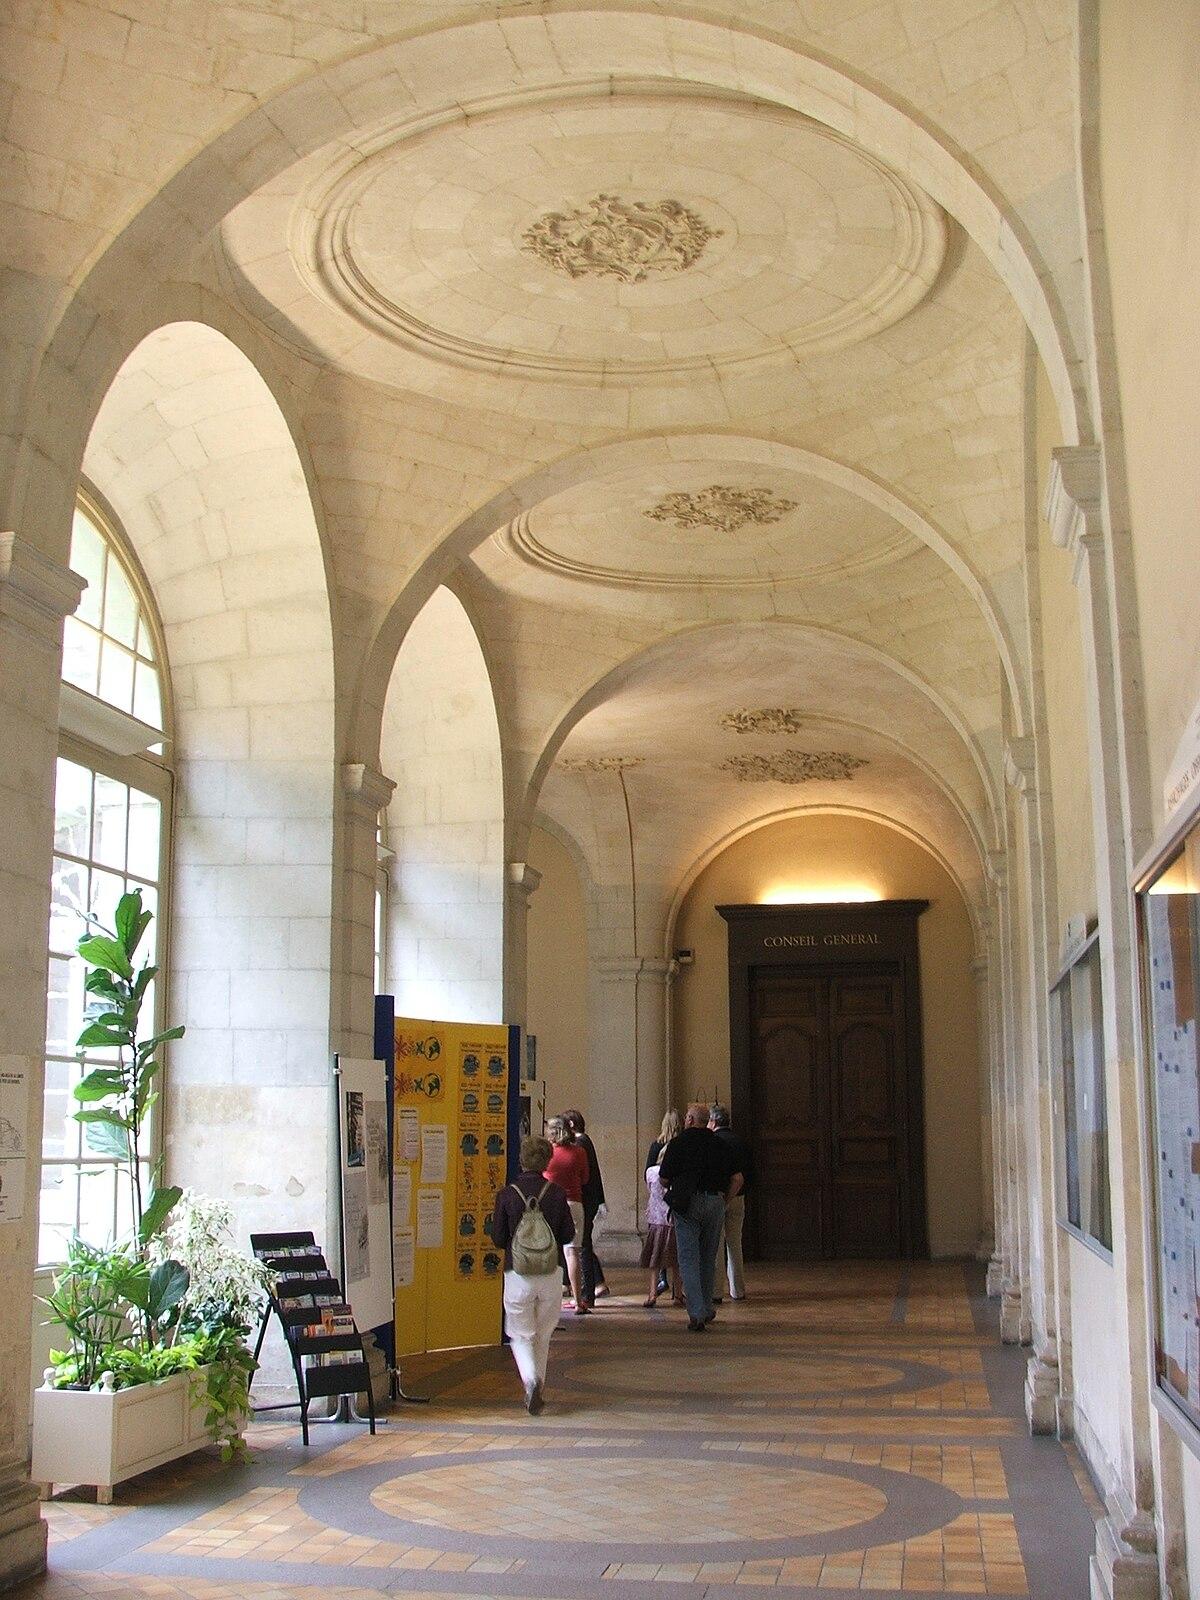 Saint-Pierre de la Couture Abbey - Wikipedia